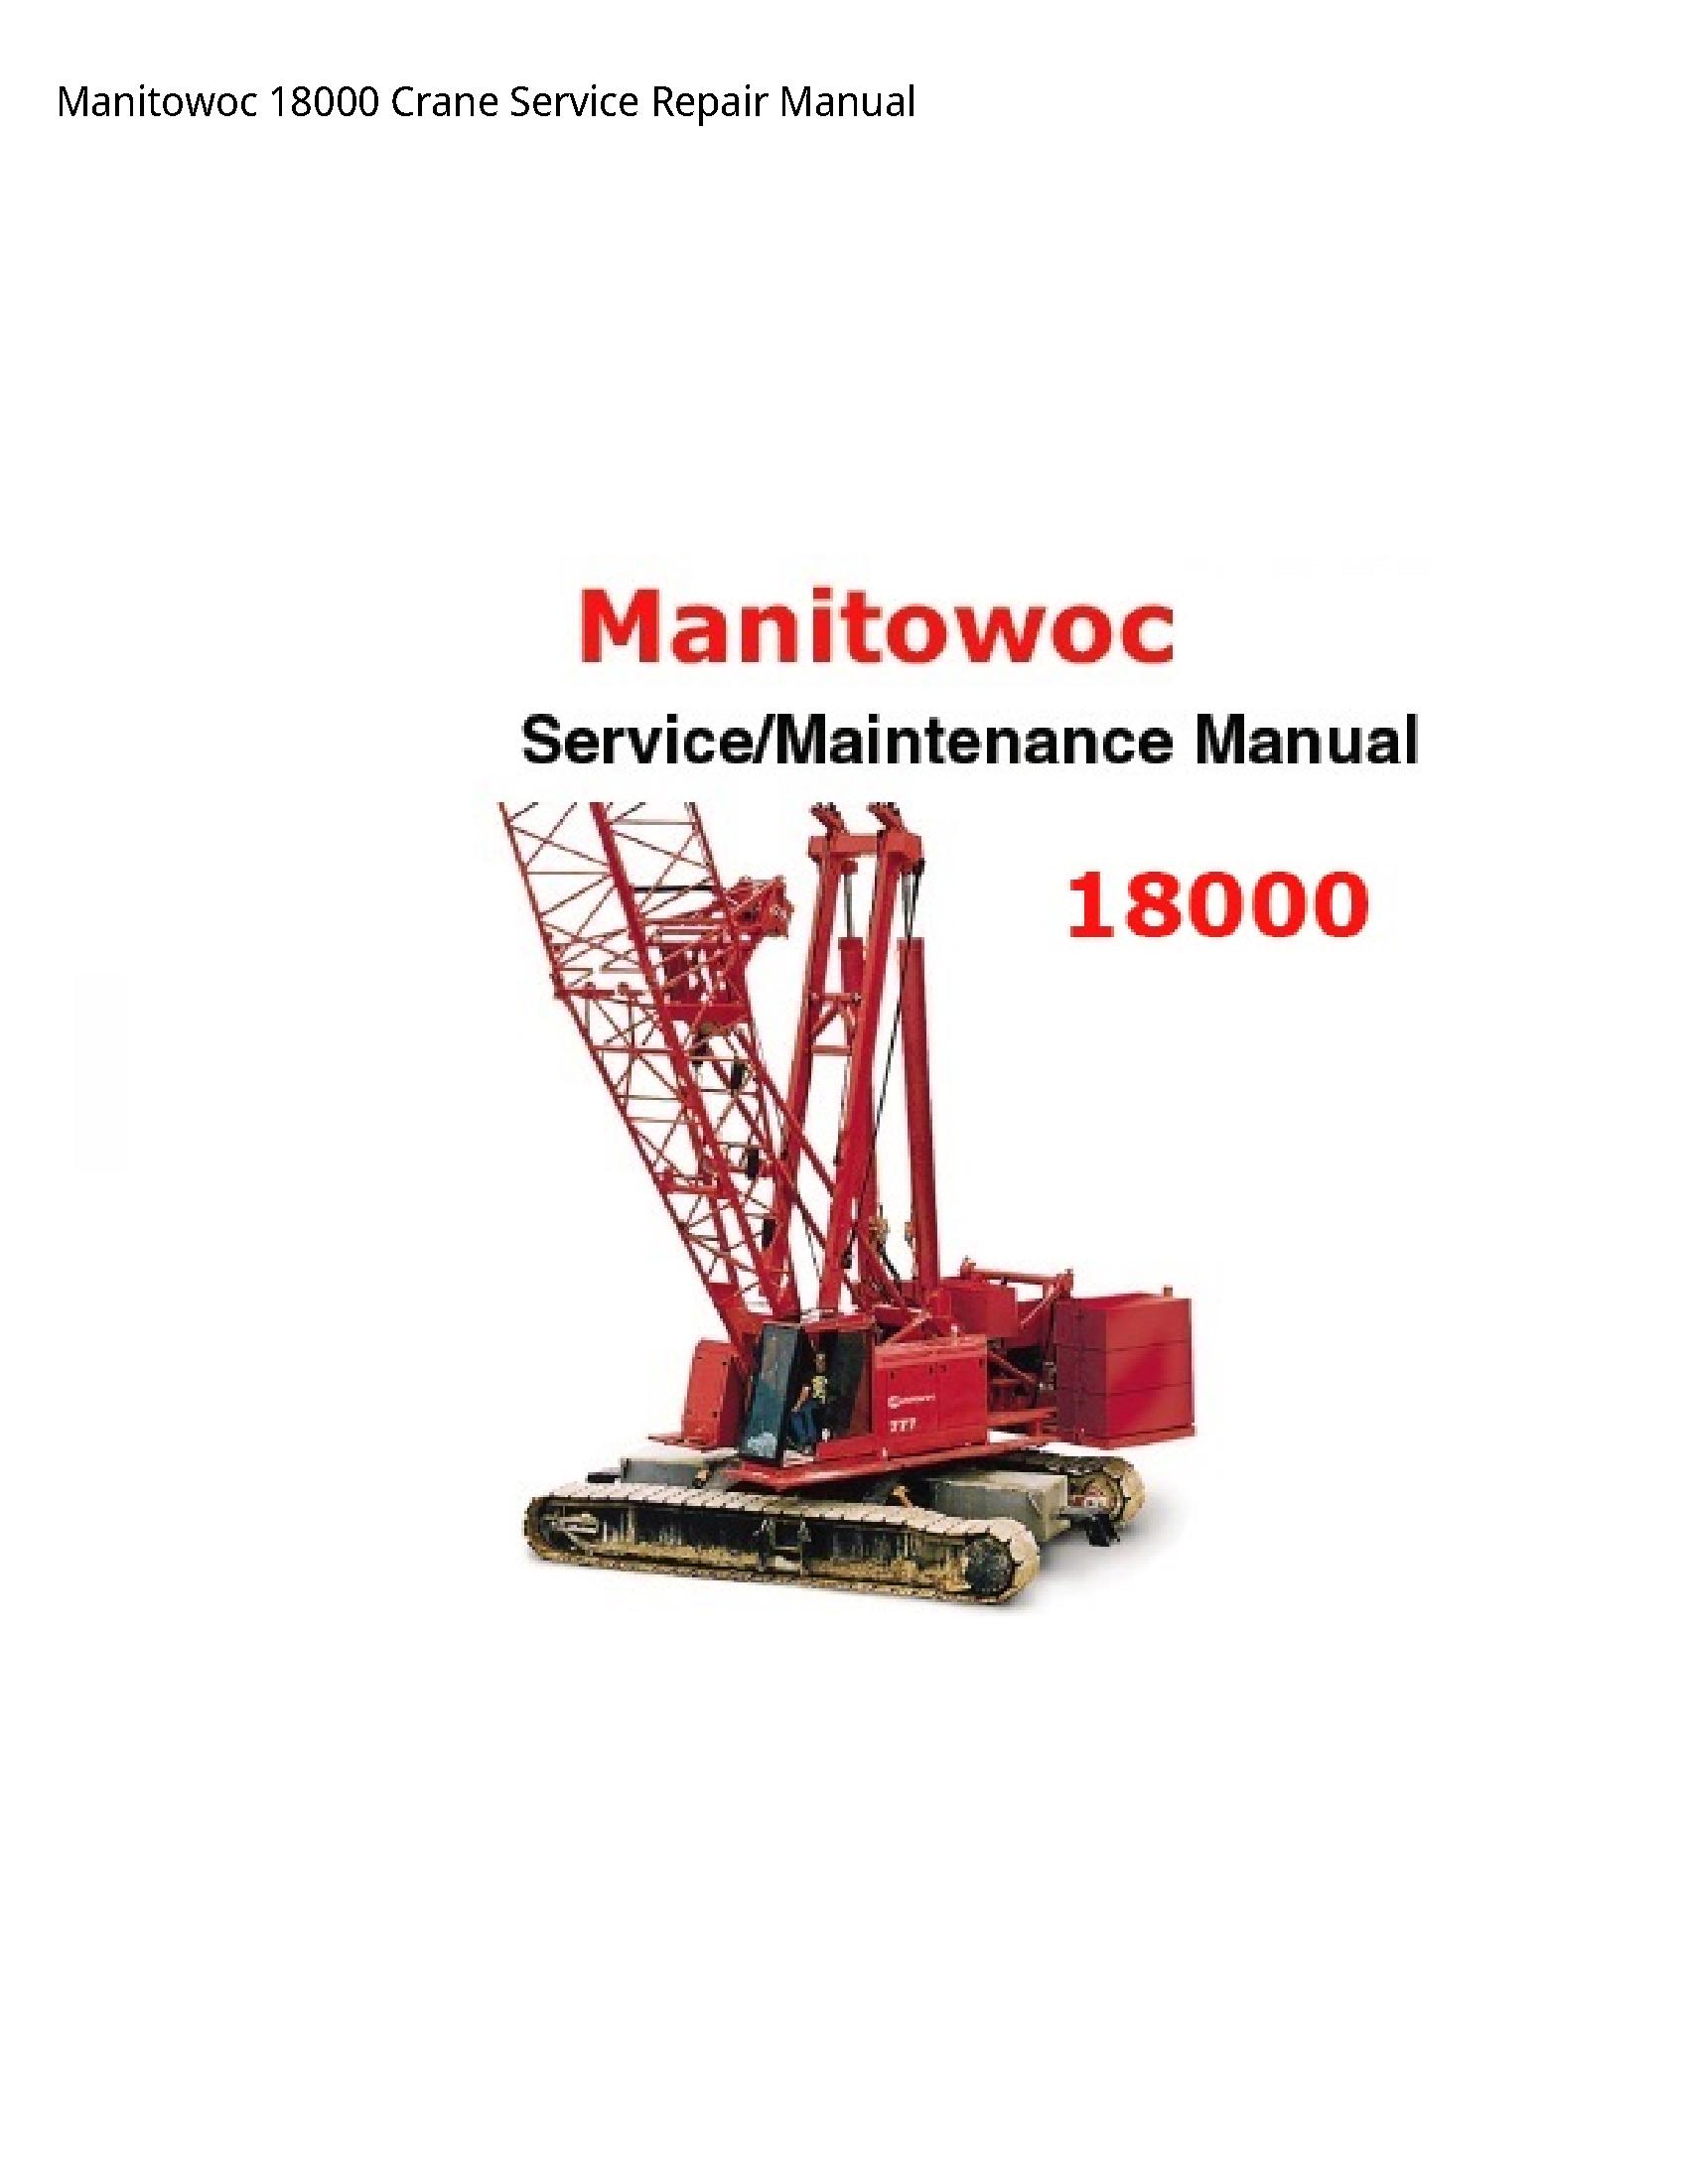 Manitowoc 18000 Crane manual